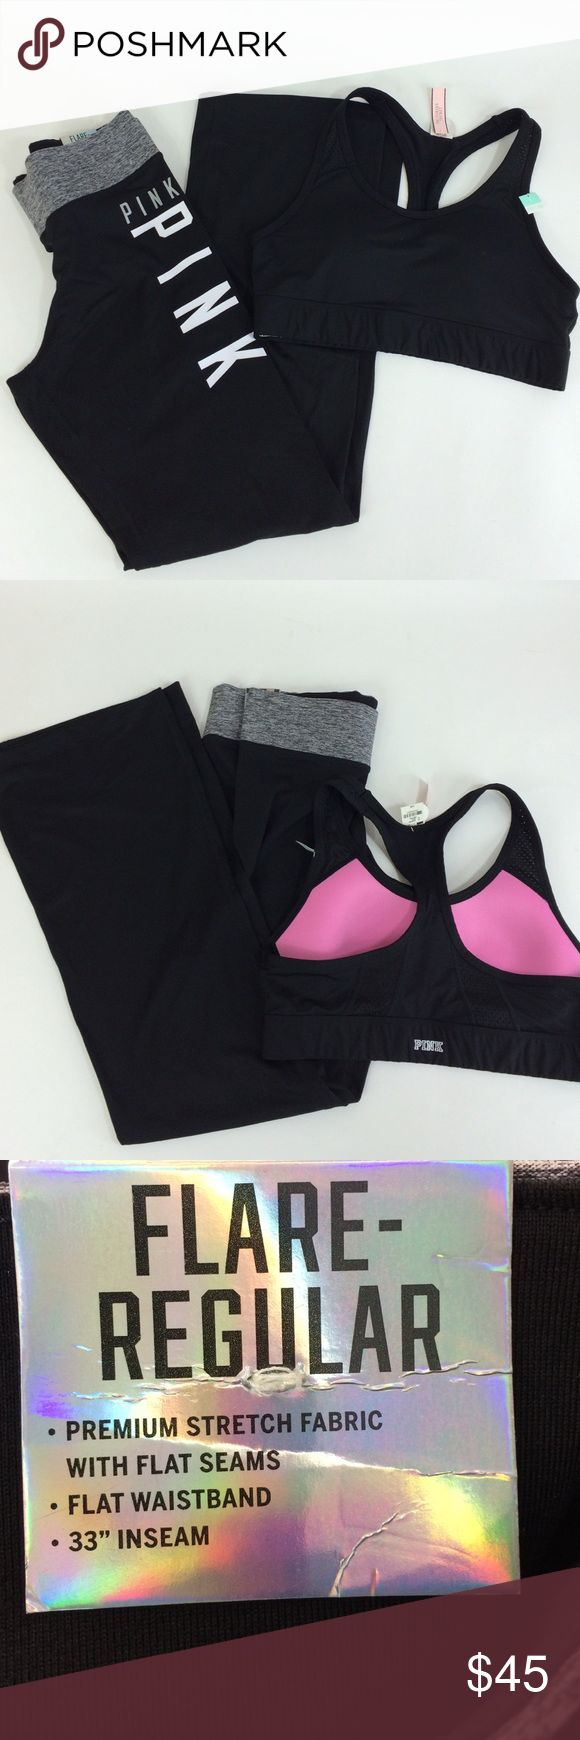 Pink ultimate sports bra & gym pants Pink Victoria's Secret ultimate lightly lined sports bra and gym pants Pink ultimate victoria's secret Intimates & Sleepwear Shapewear